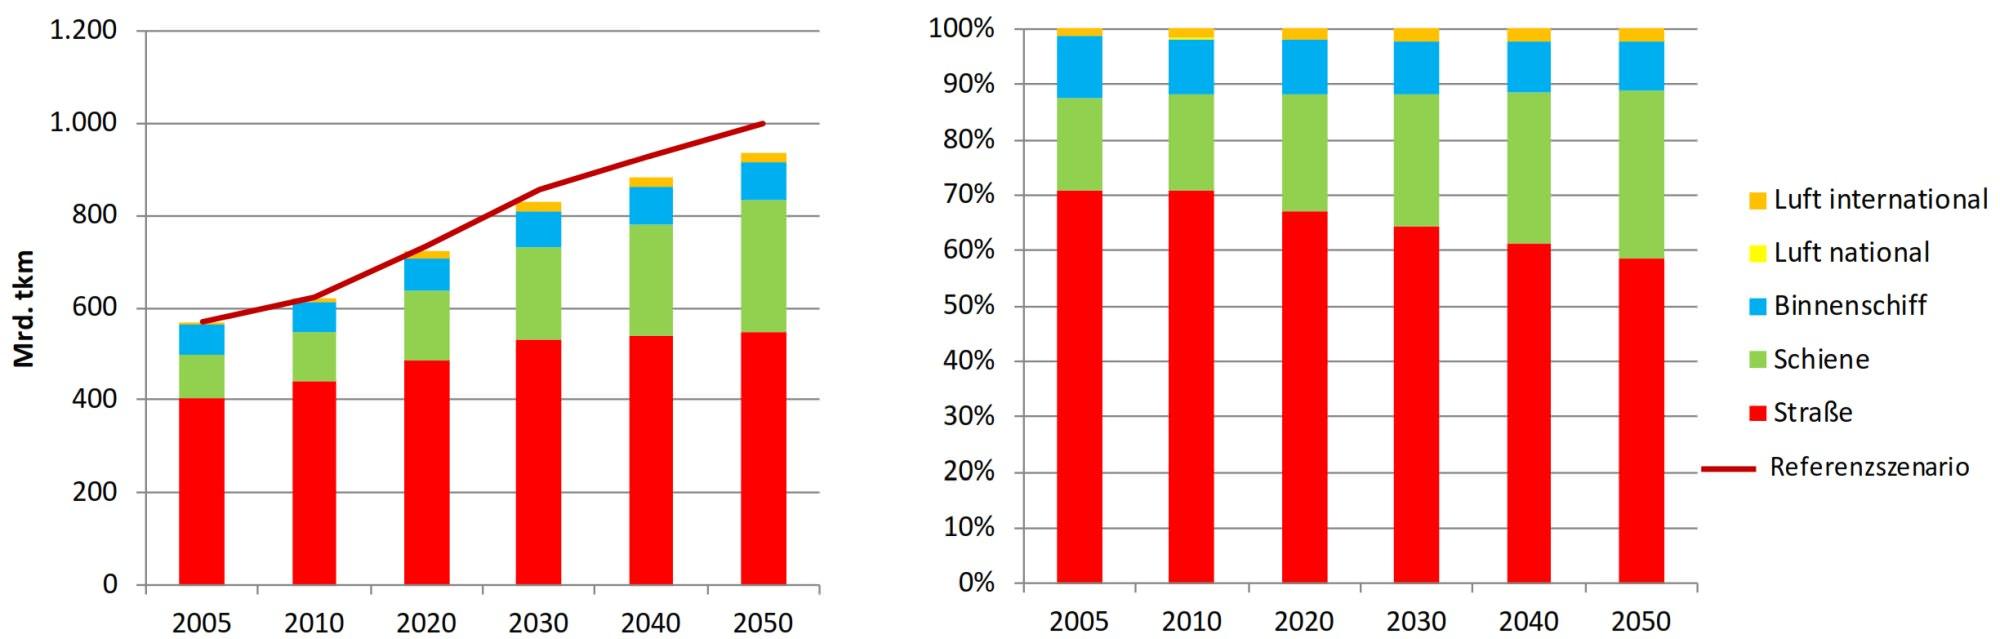 Klimaschutz Güterverkehr Entwicklung 2050 Verkehrsleistung Modal Split